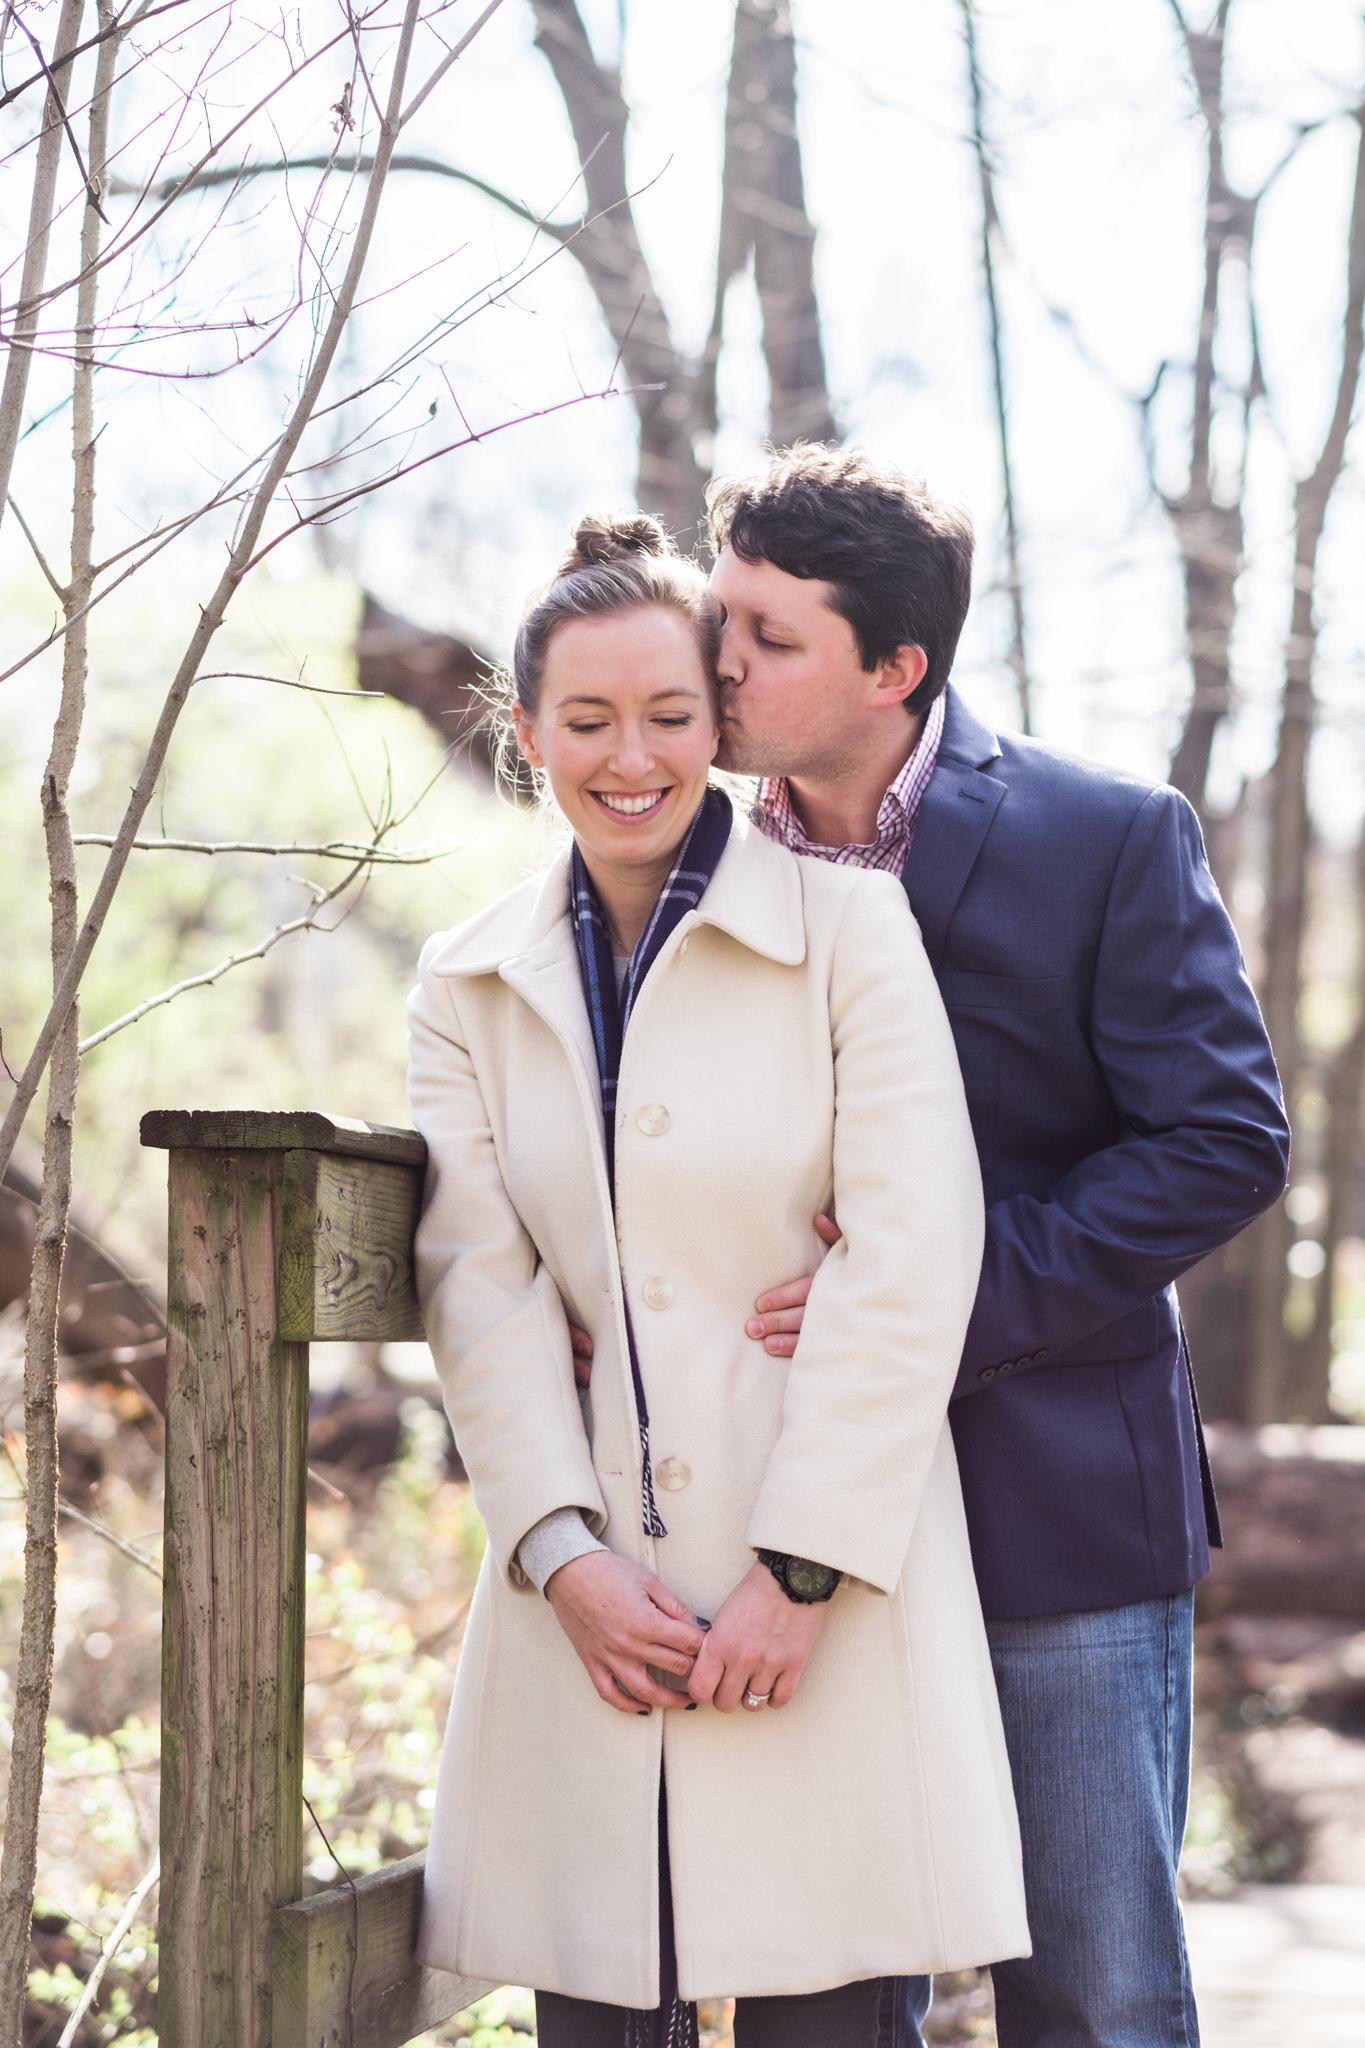 Stephanie&Dan_Engagement_Blog_0003.jpg